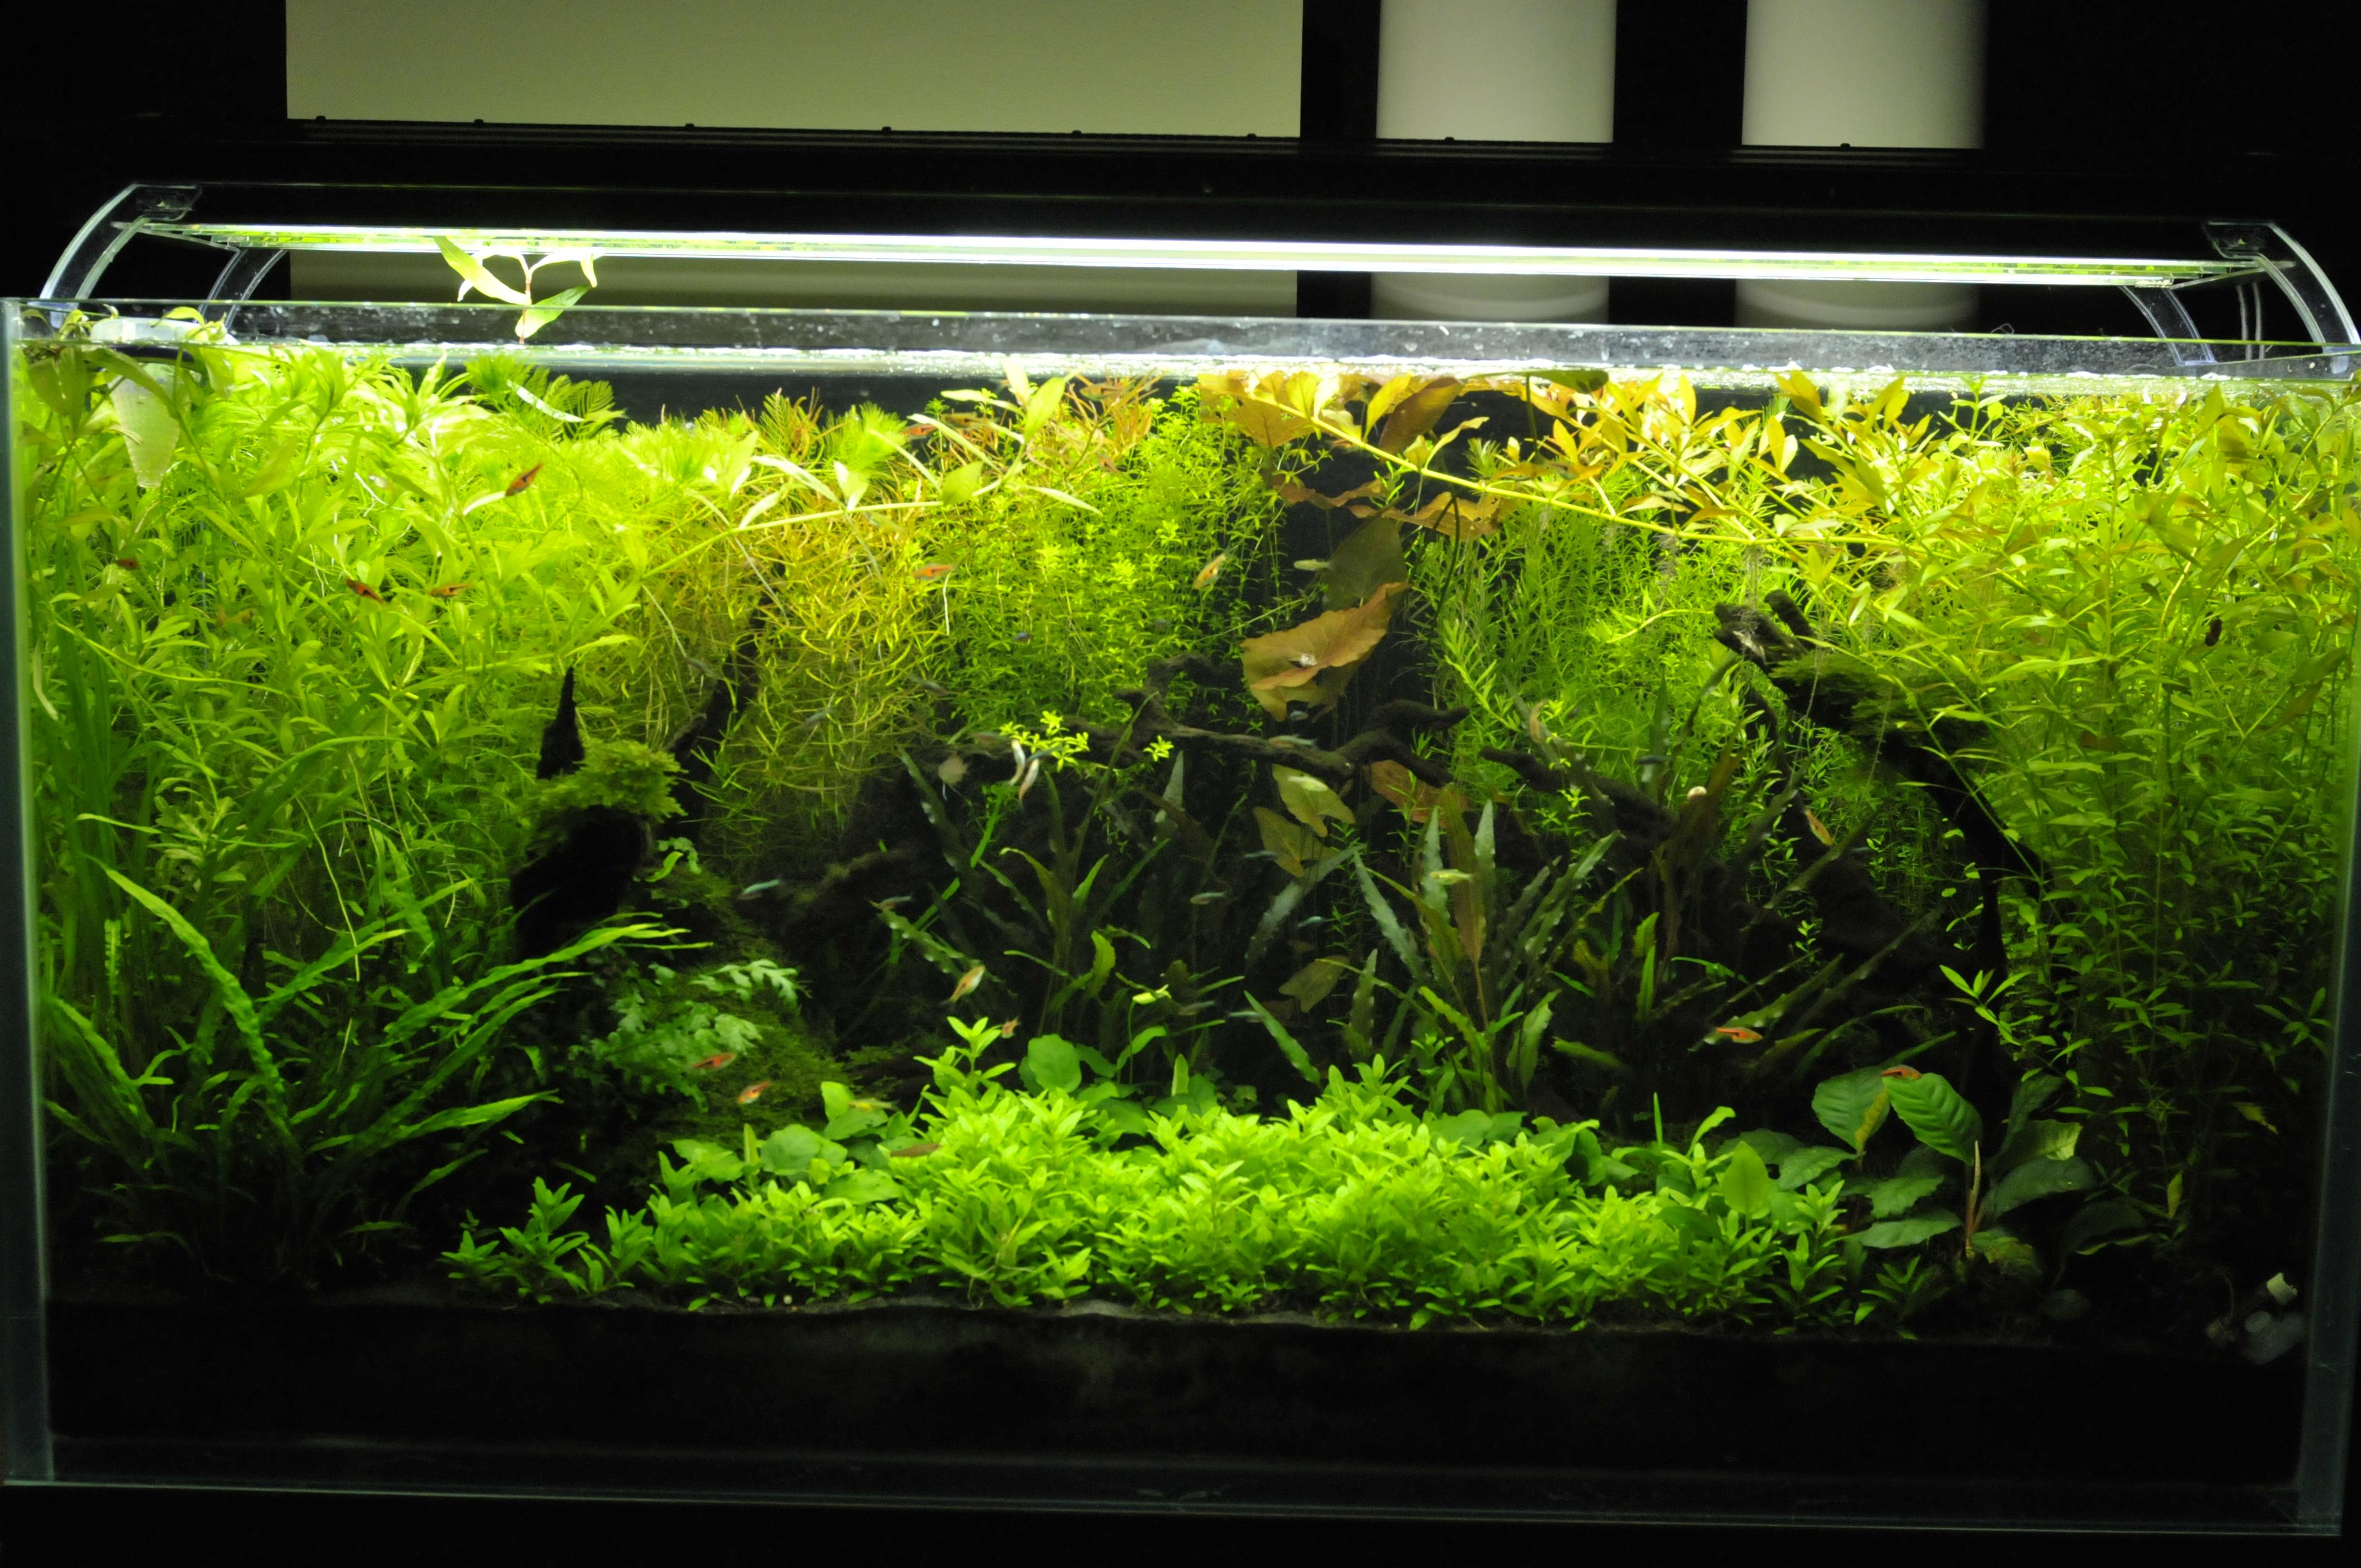 aquarium pflanzen d nger auf kohlenstoffbasis 250ml braunschweig. Black Bedroom Furniture Sets. Home Design Ideas